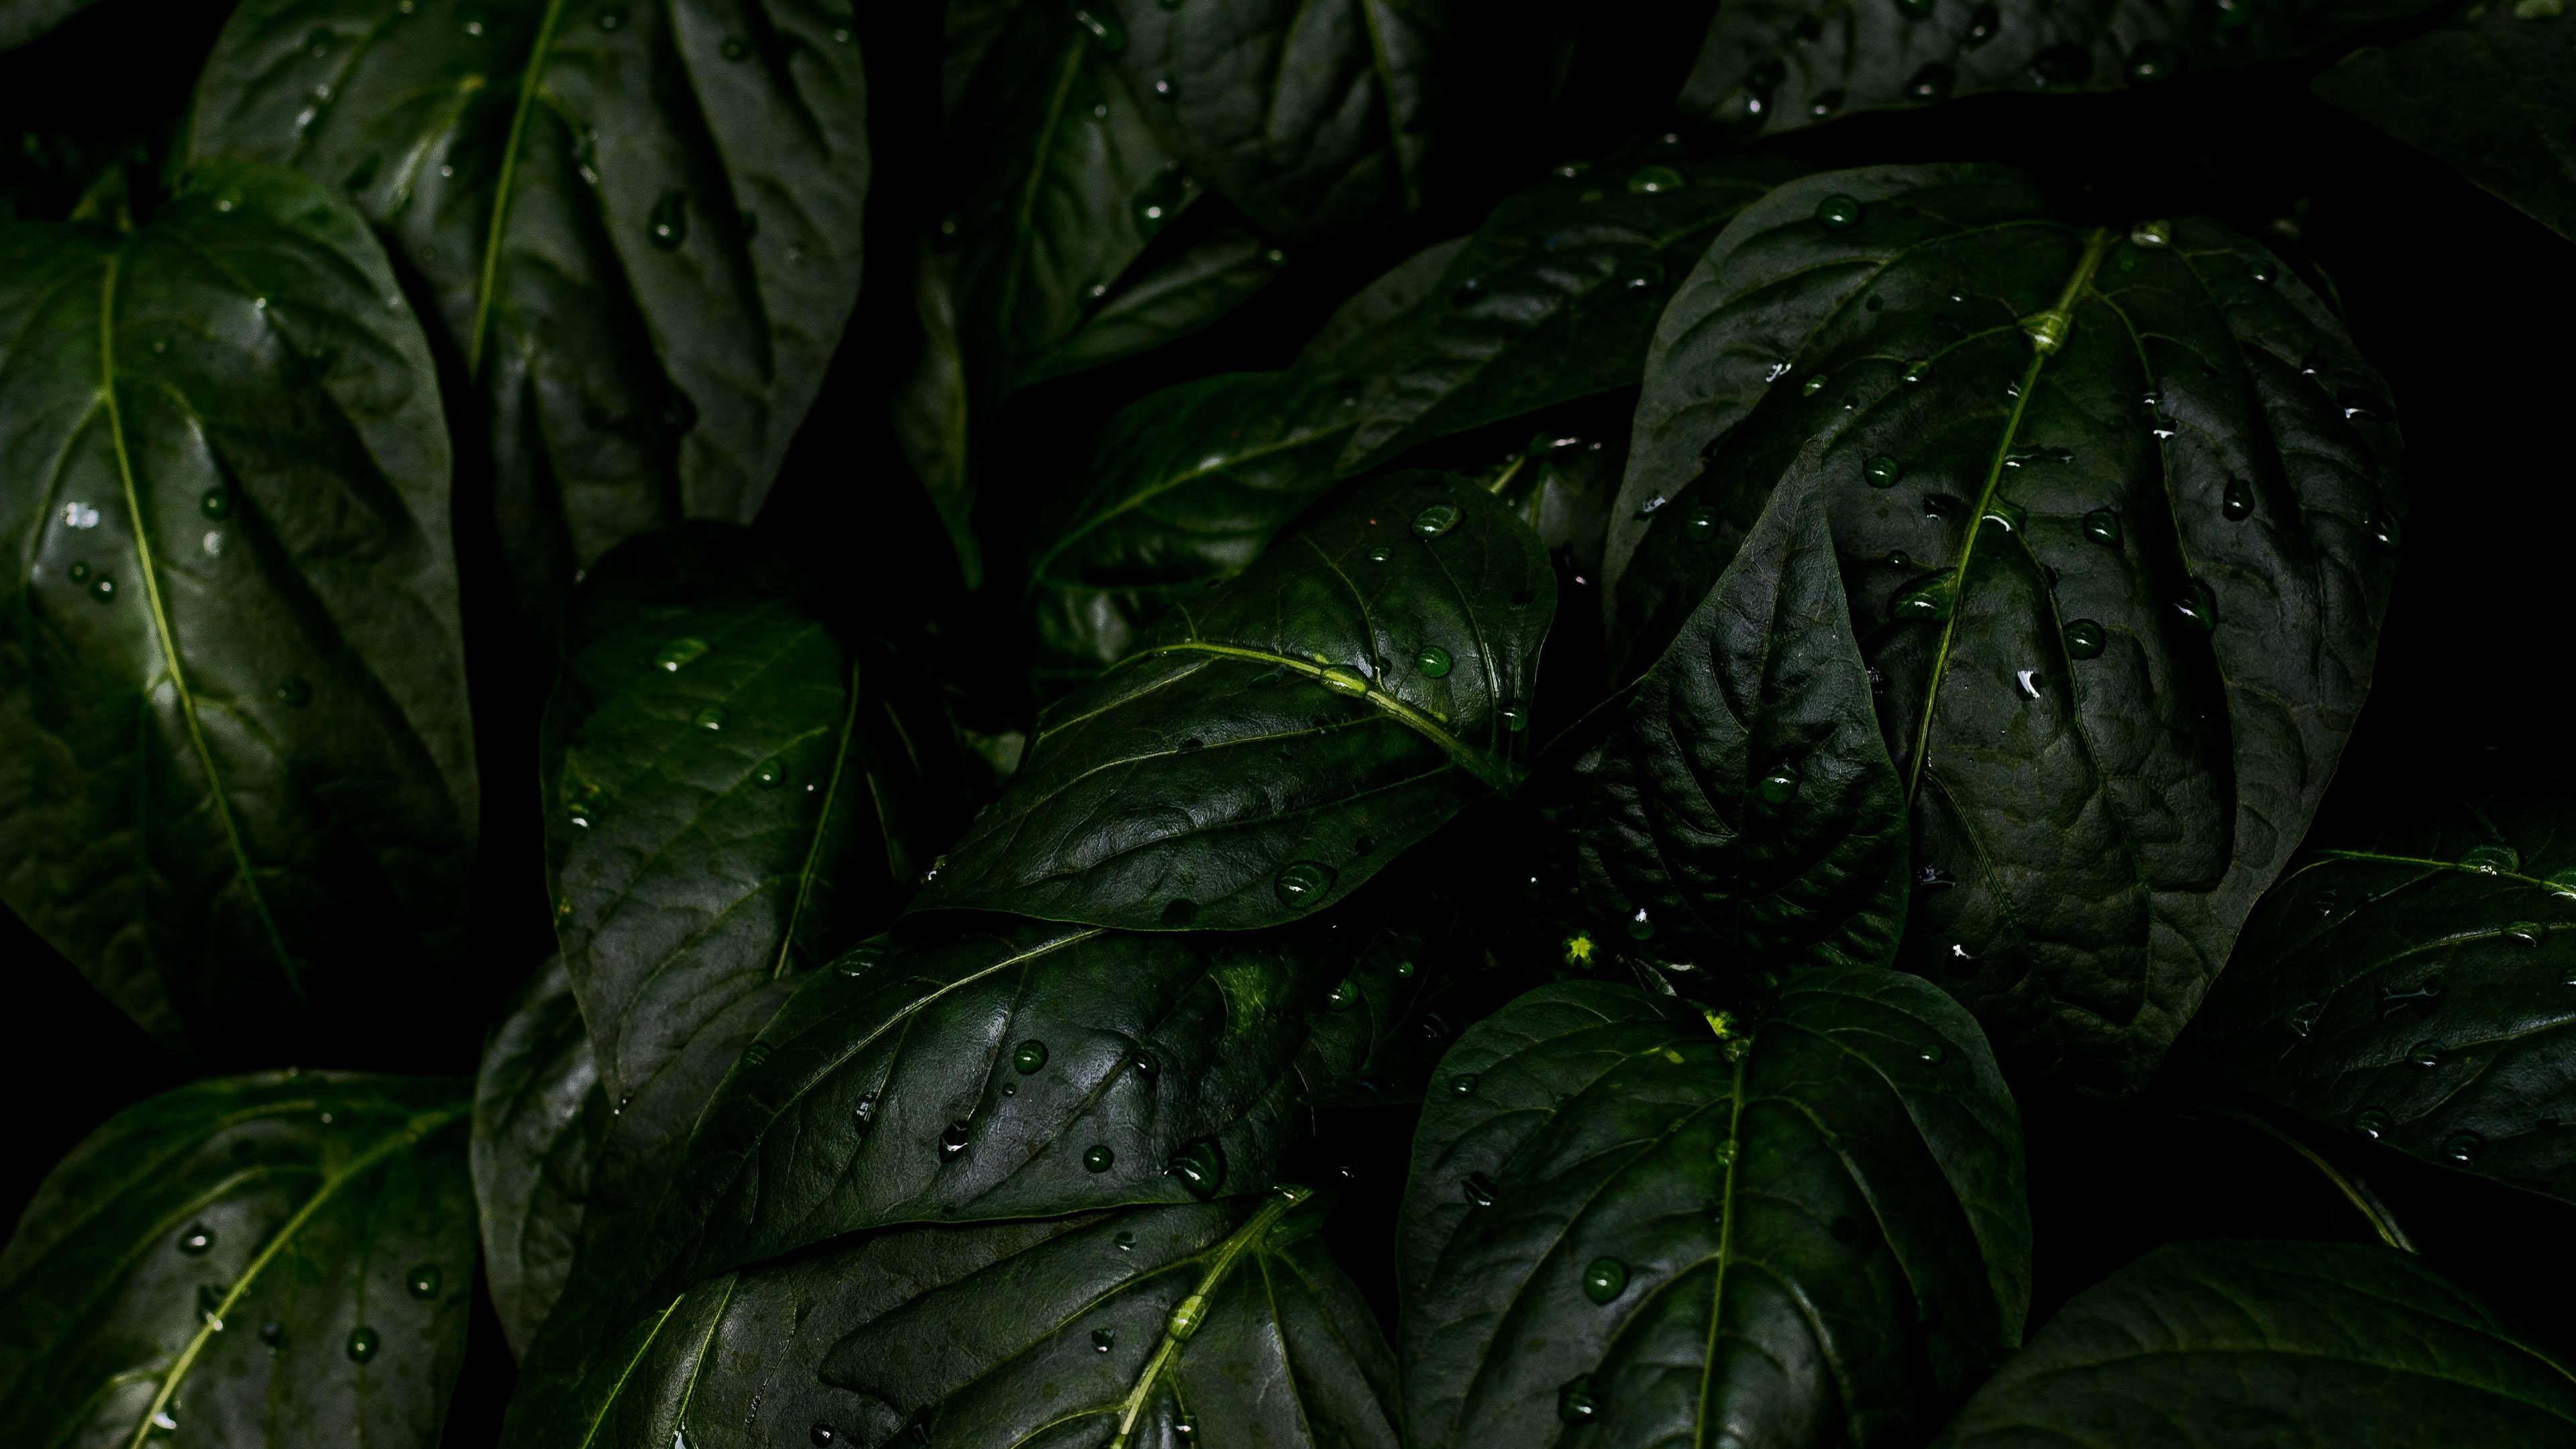 Rain Drops Leaves Uhd 4k Wallpaper Pixelz